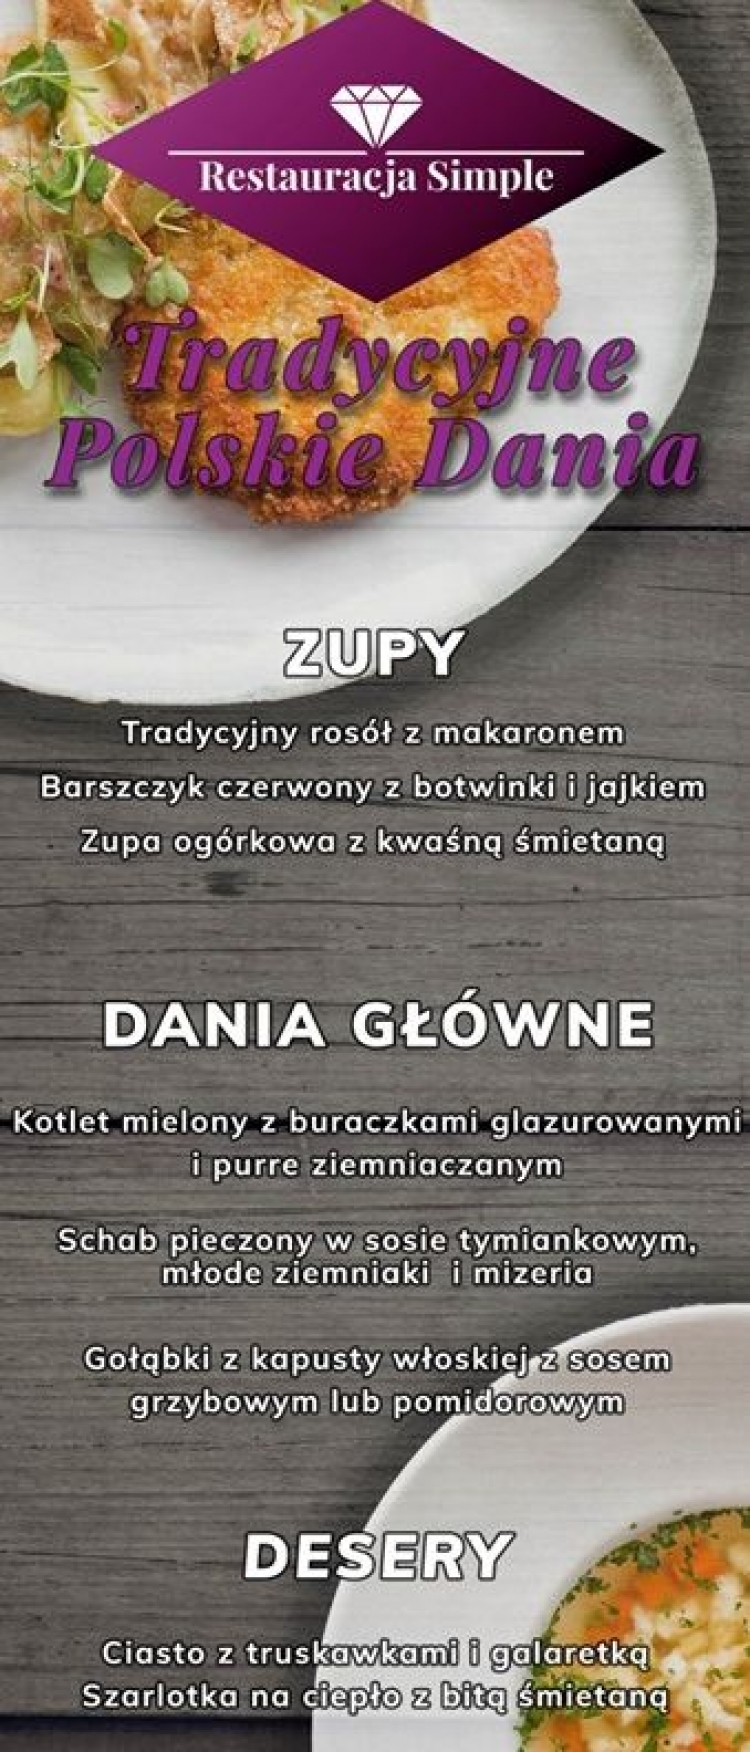 Szlak Kulinarny Podkarpackie Smaki